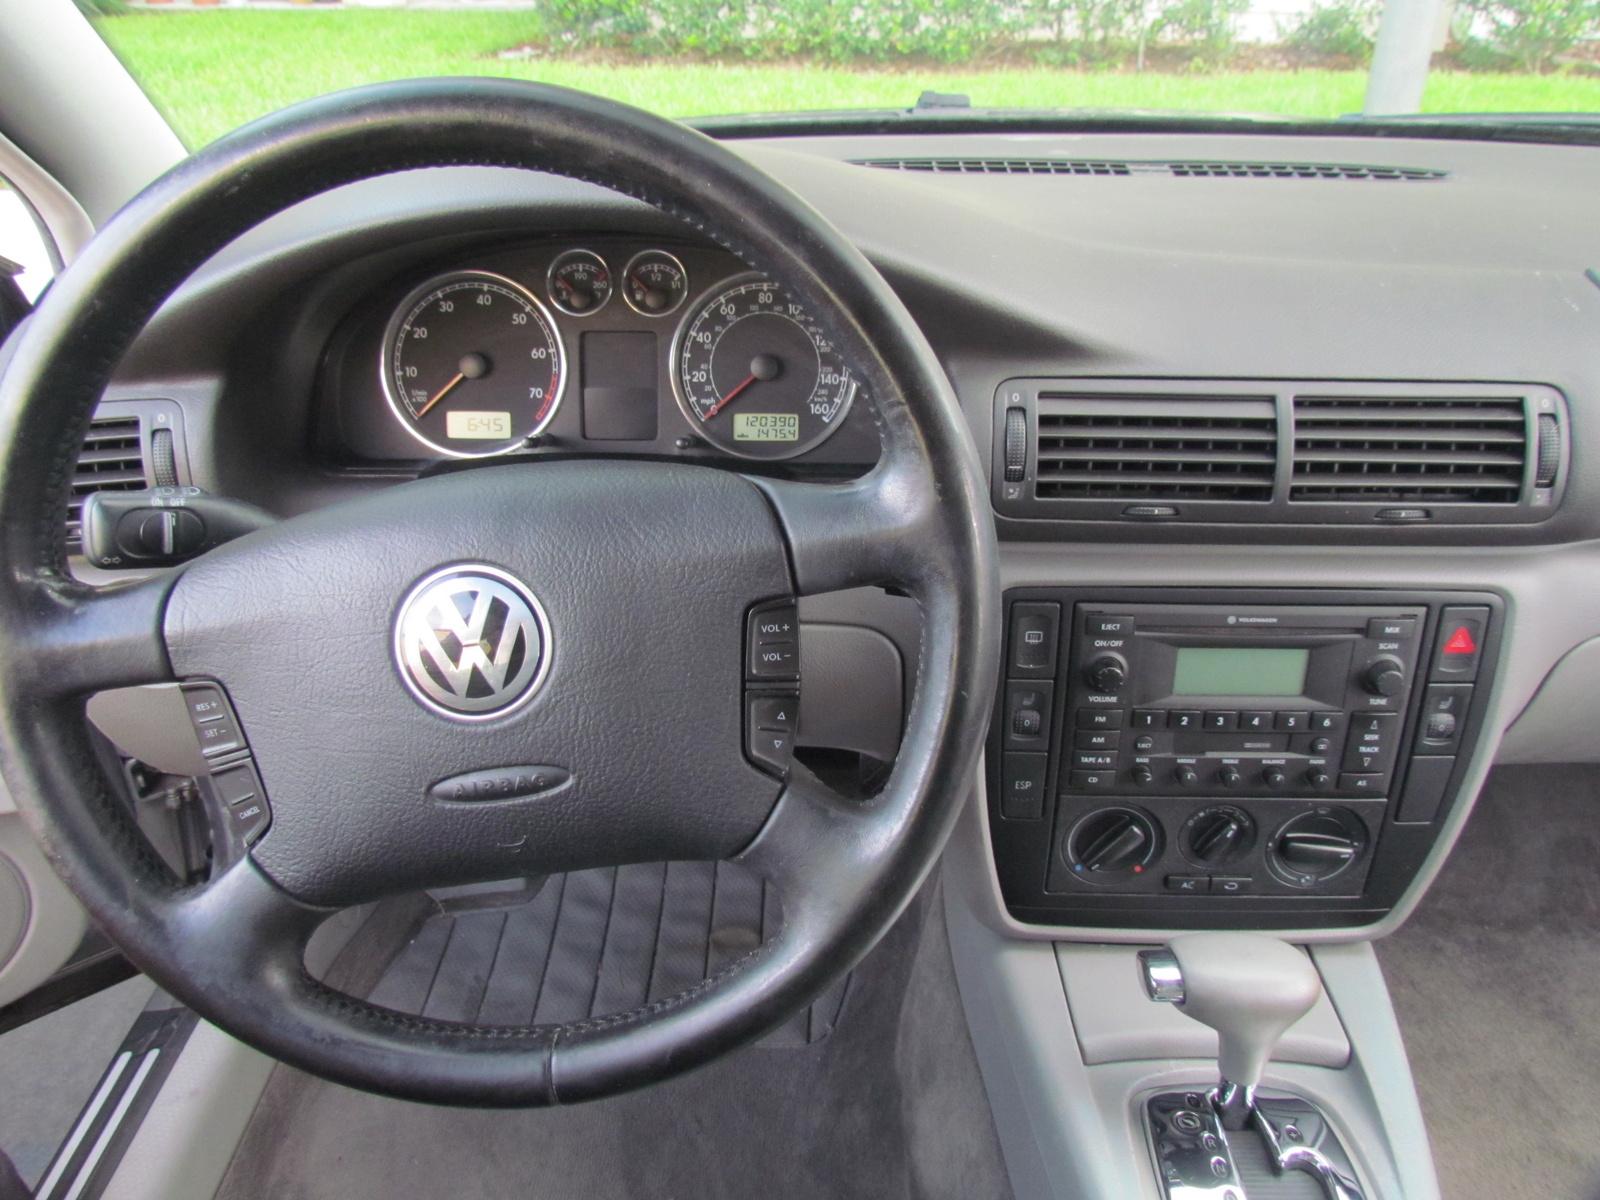 2003 volkswagen passat interior pictures cargurus for Volkswagen passat 2000 interior